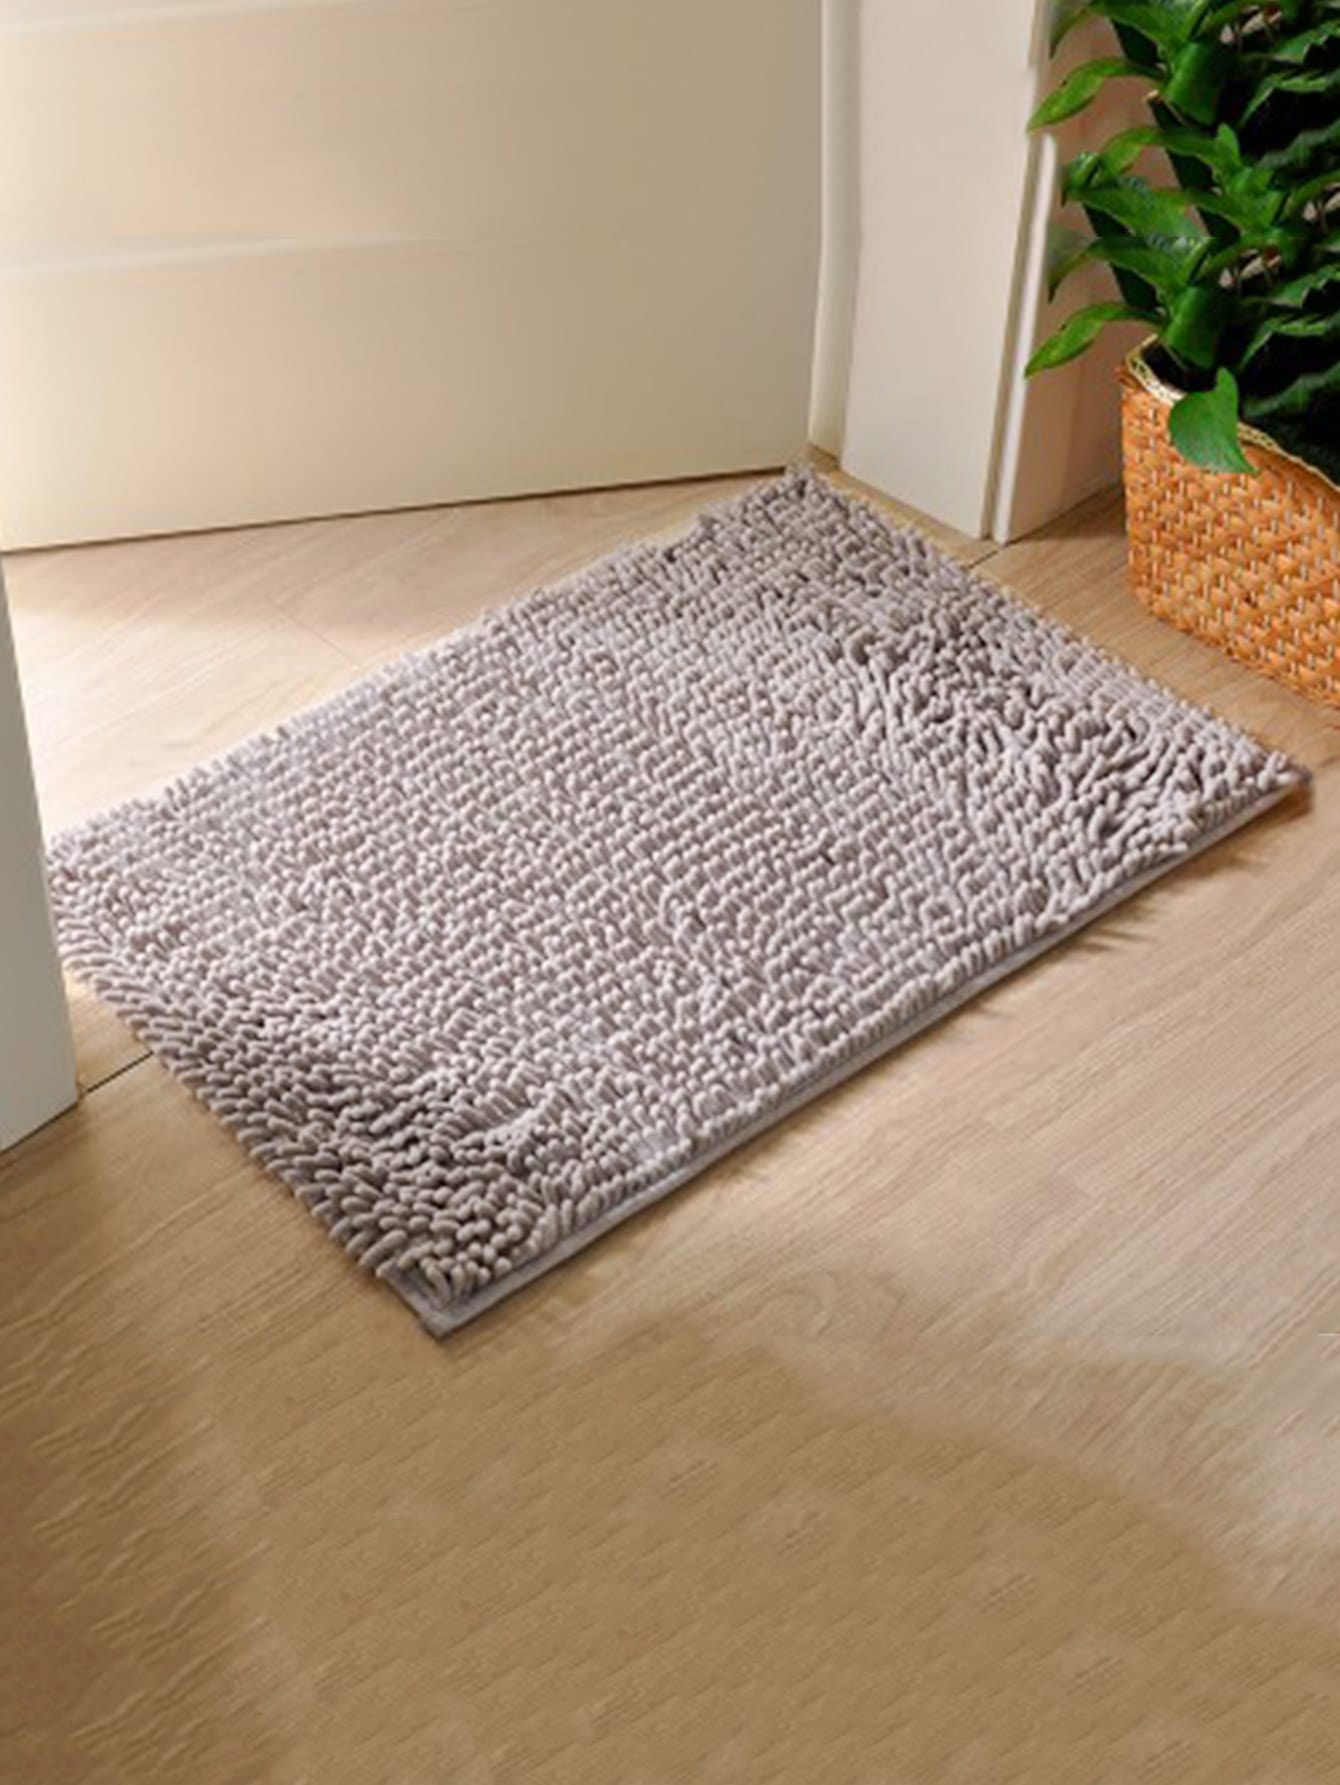 chenille weicher rubber anti rutsch teppich german romwe. Black Bedroom Furniture Sets. Home Design Ideas